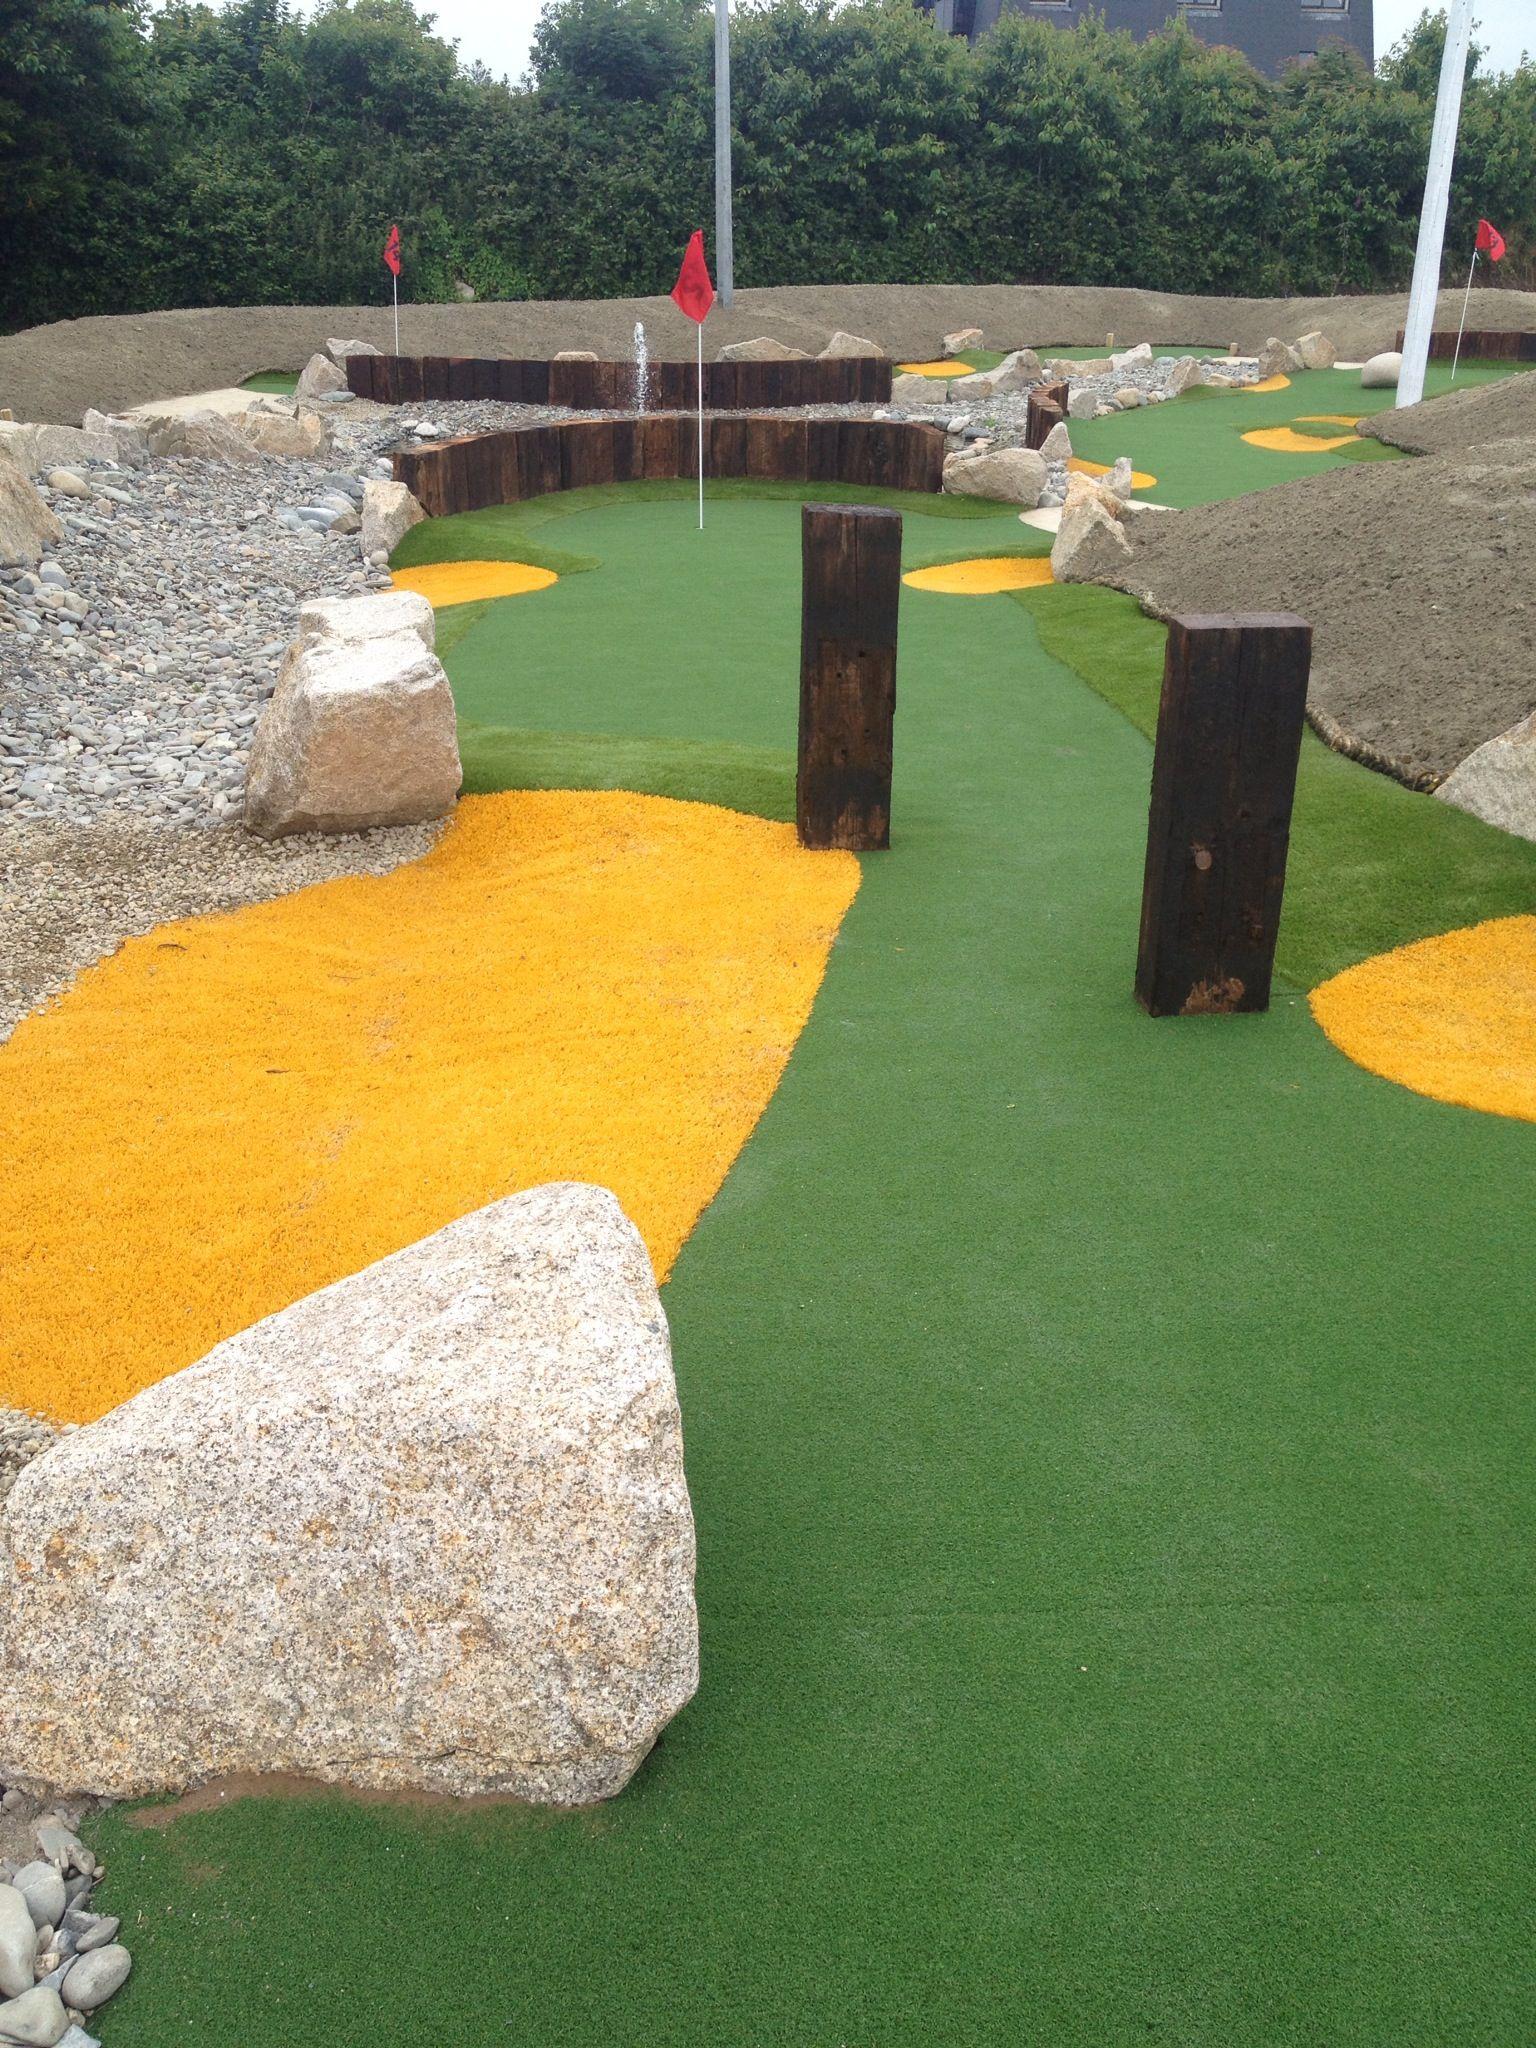 Pin On Minigolf Course Mini backyard golf course